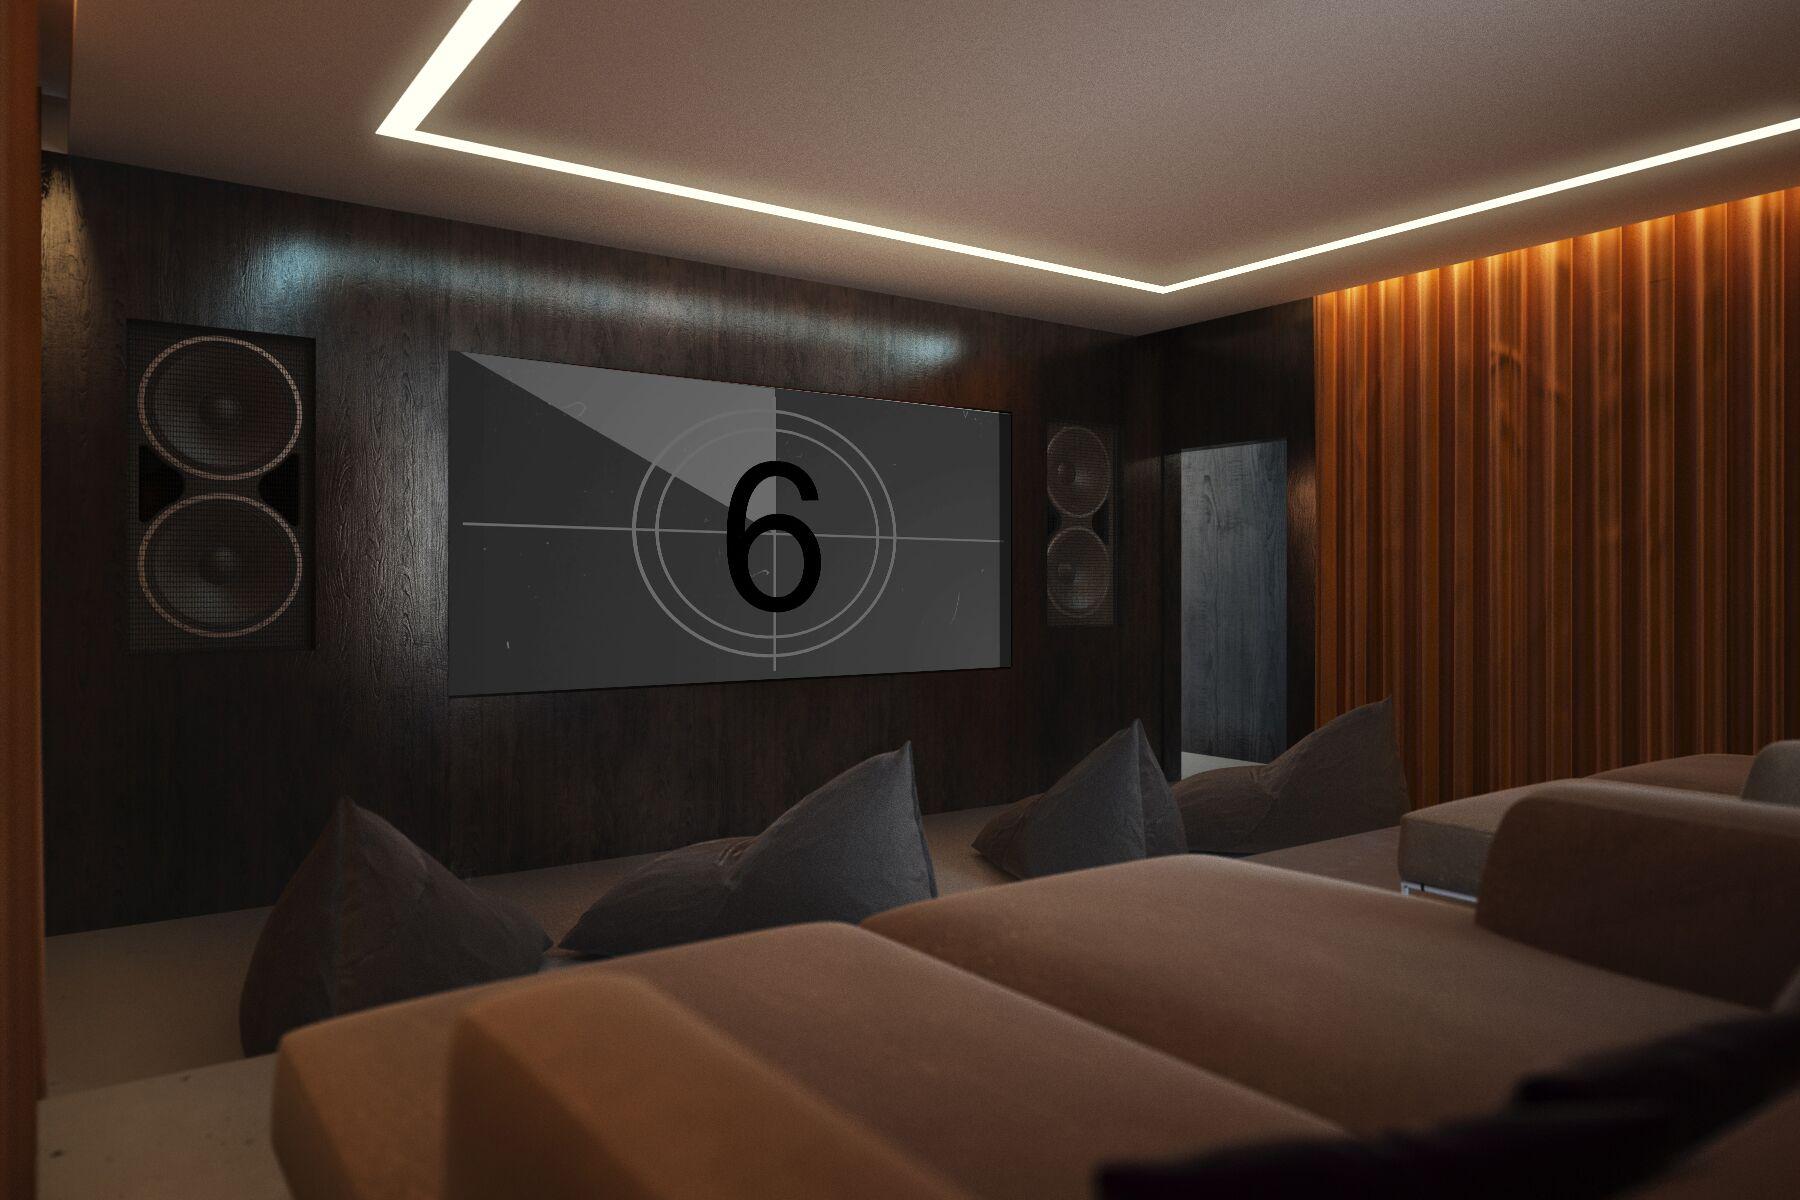 Cinema Room copy 2_preview.jpeg